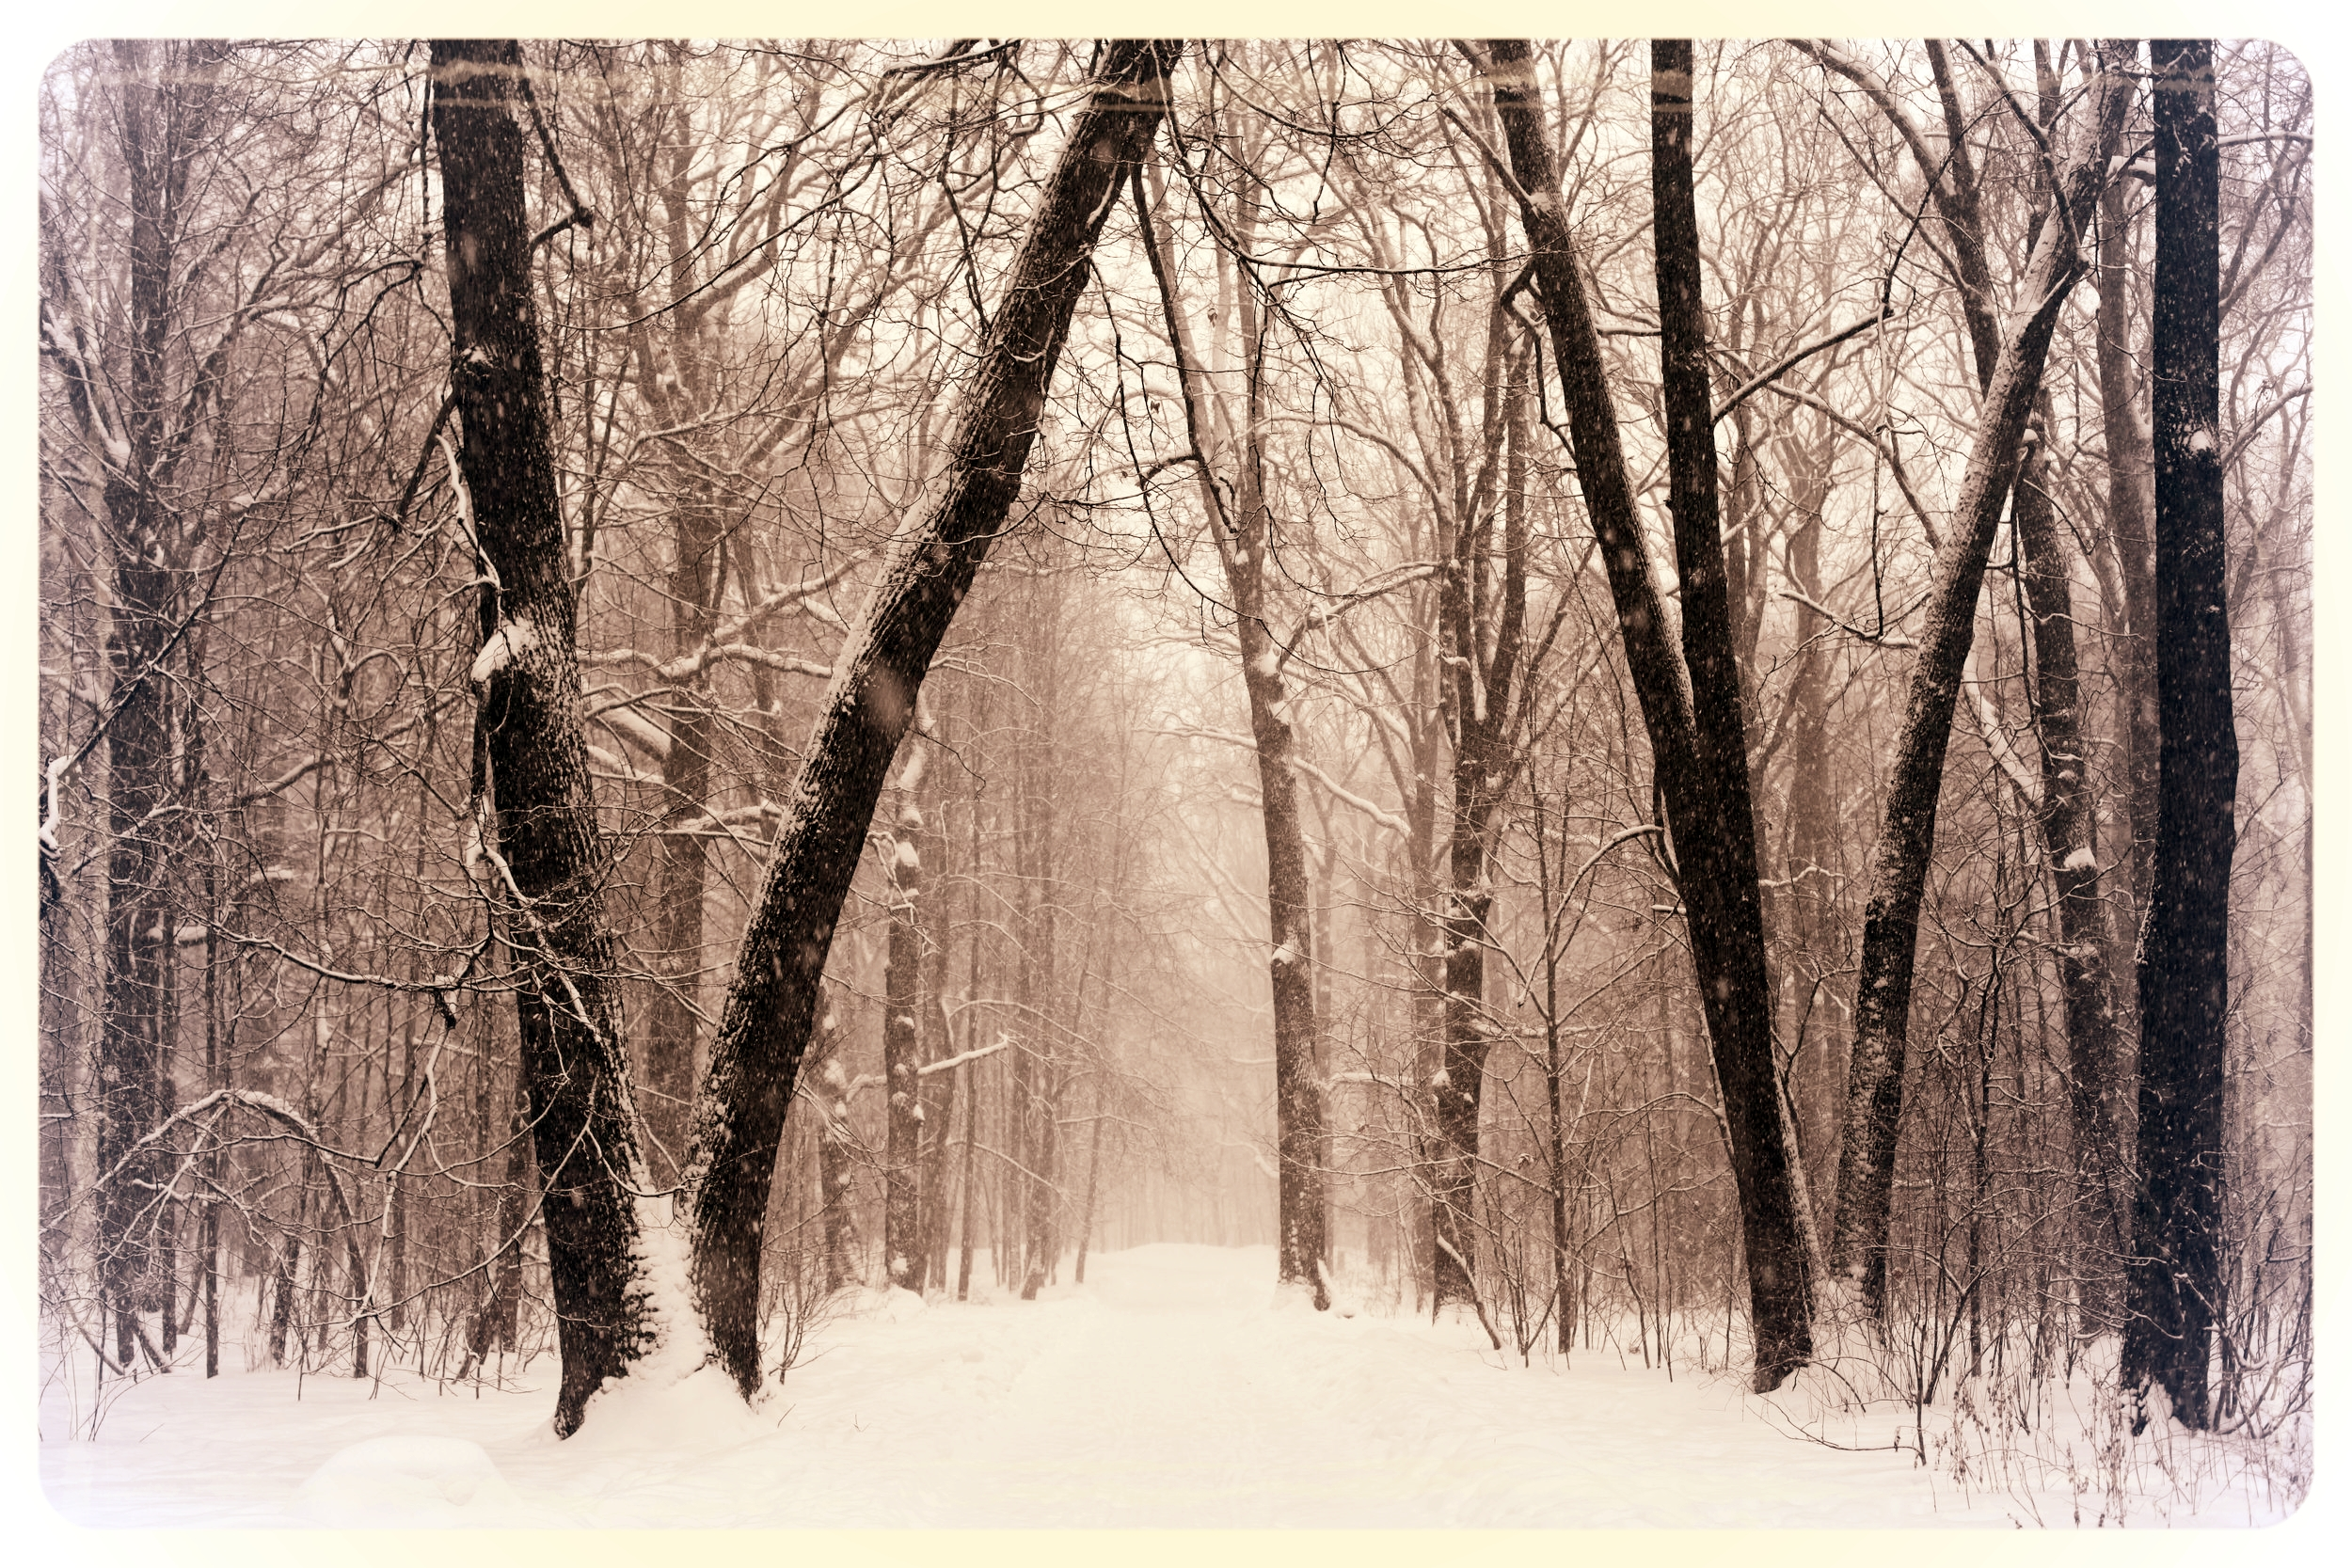 park-winter-russia-city-park-163756.jpeg